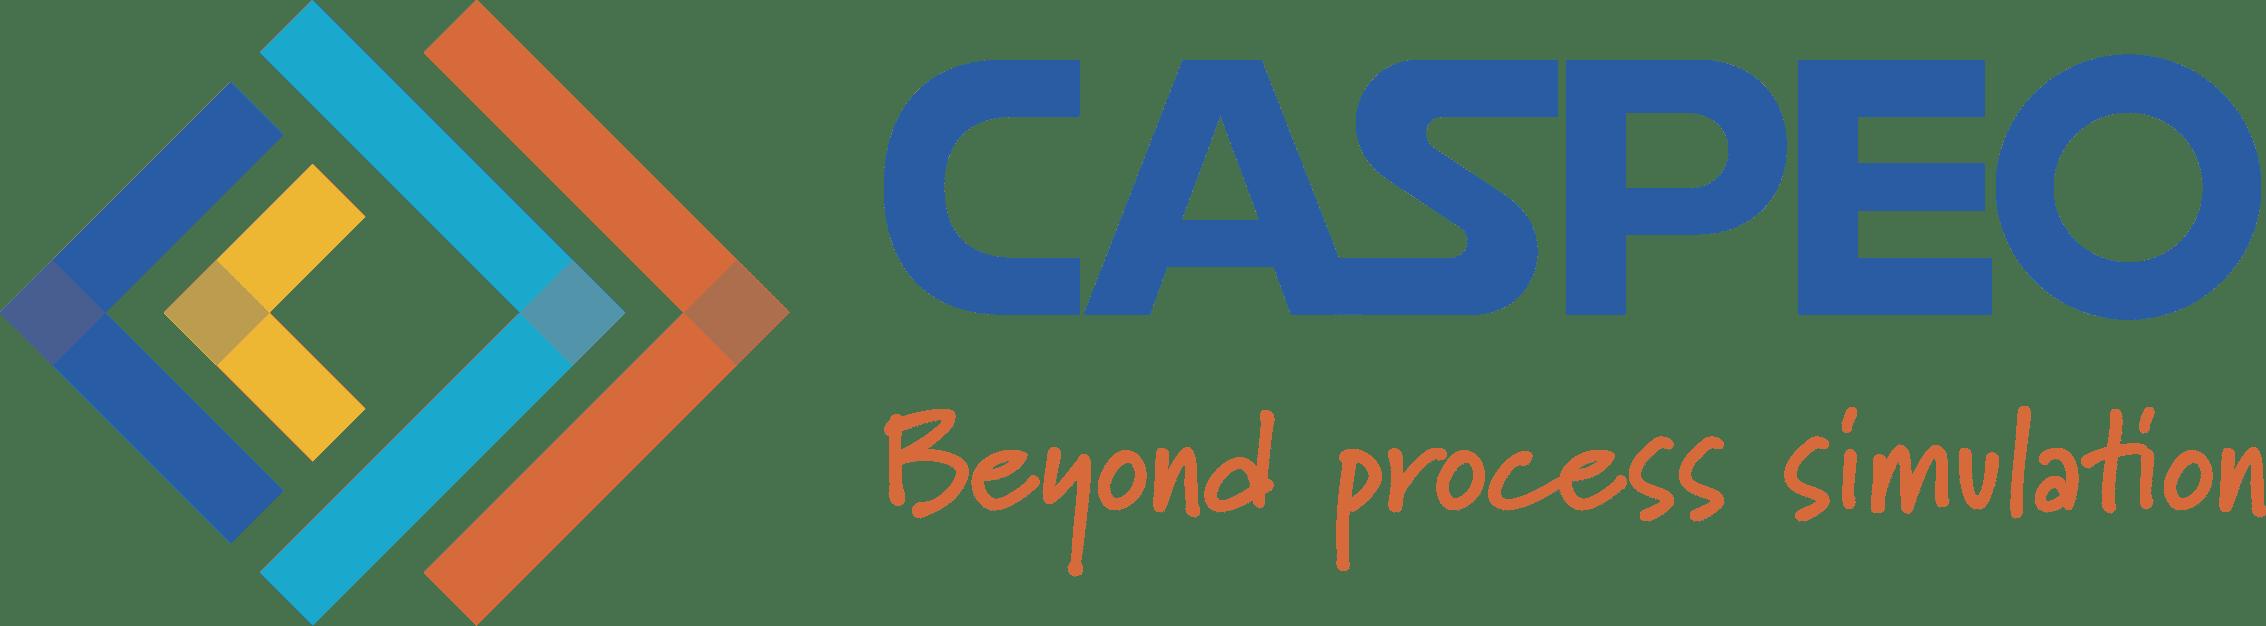 CASPEO SUPPORT